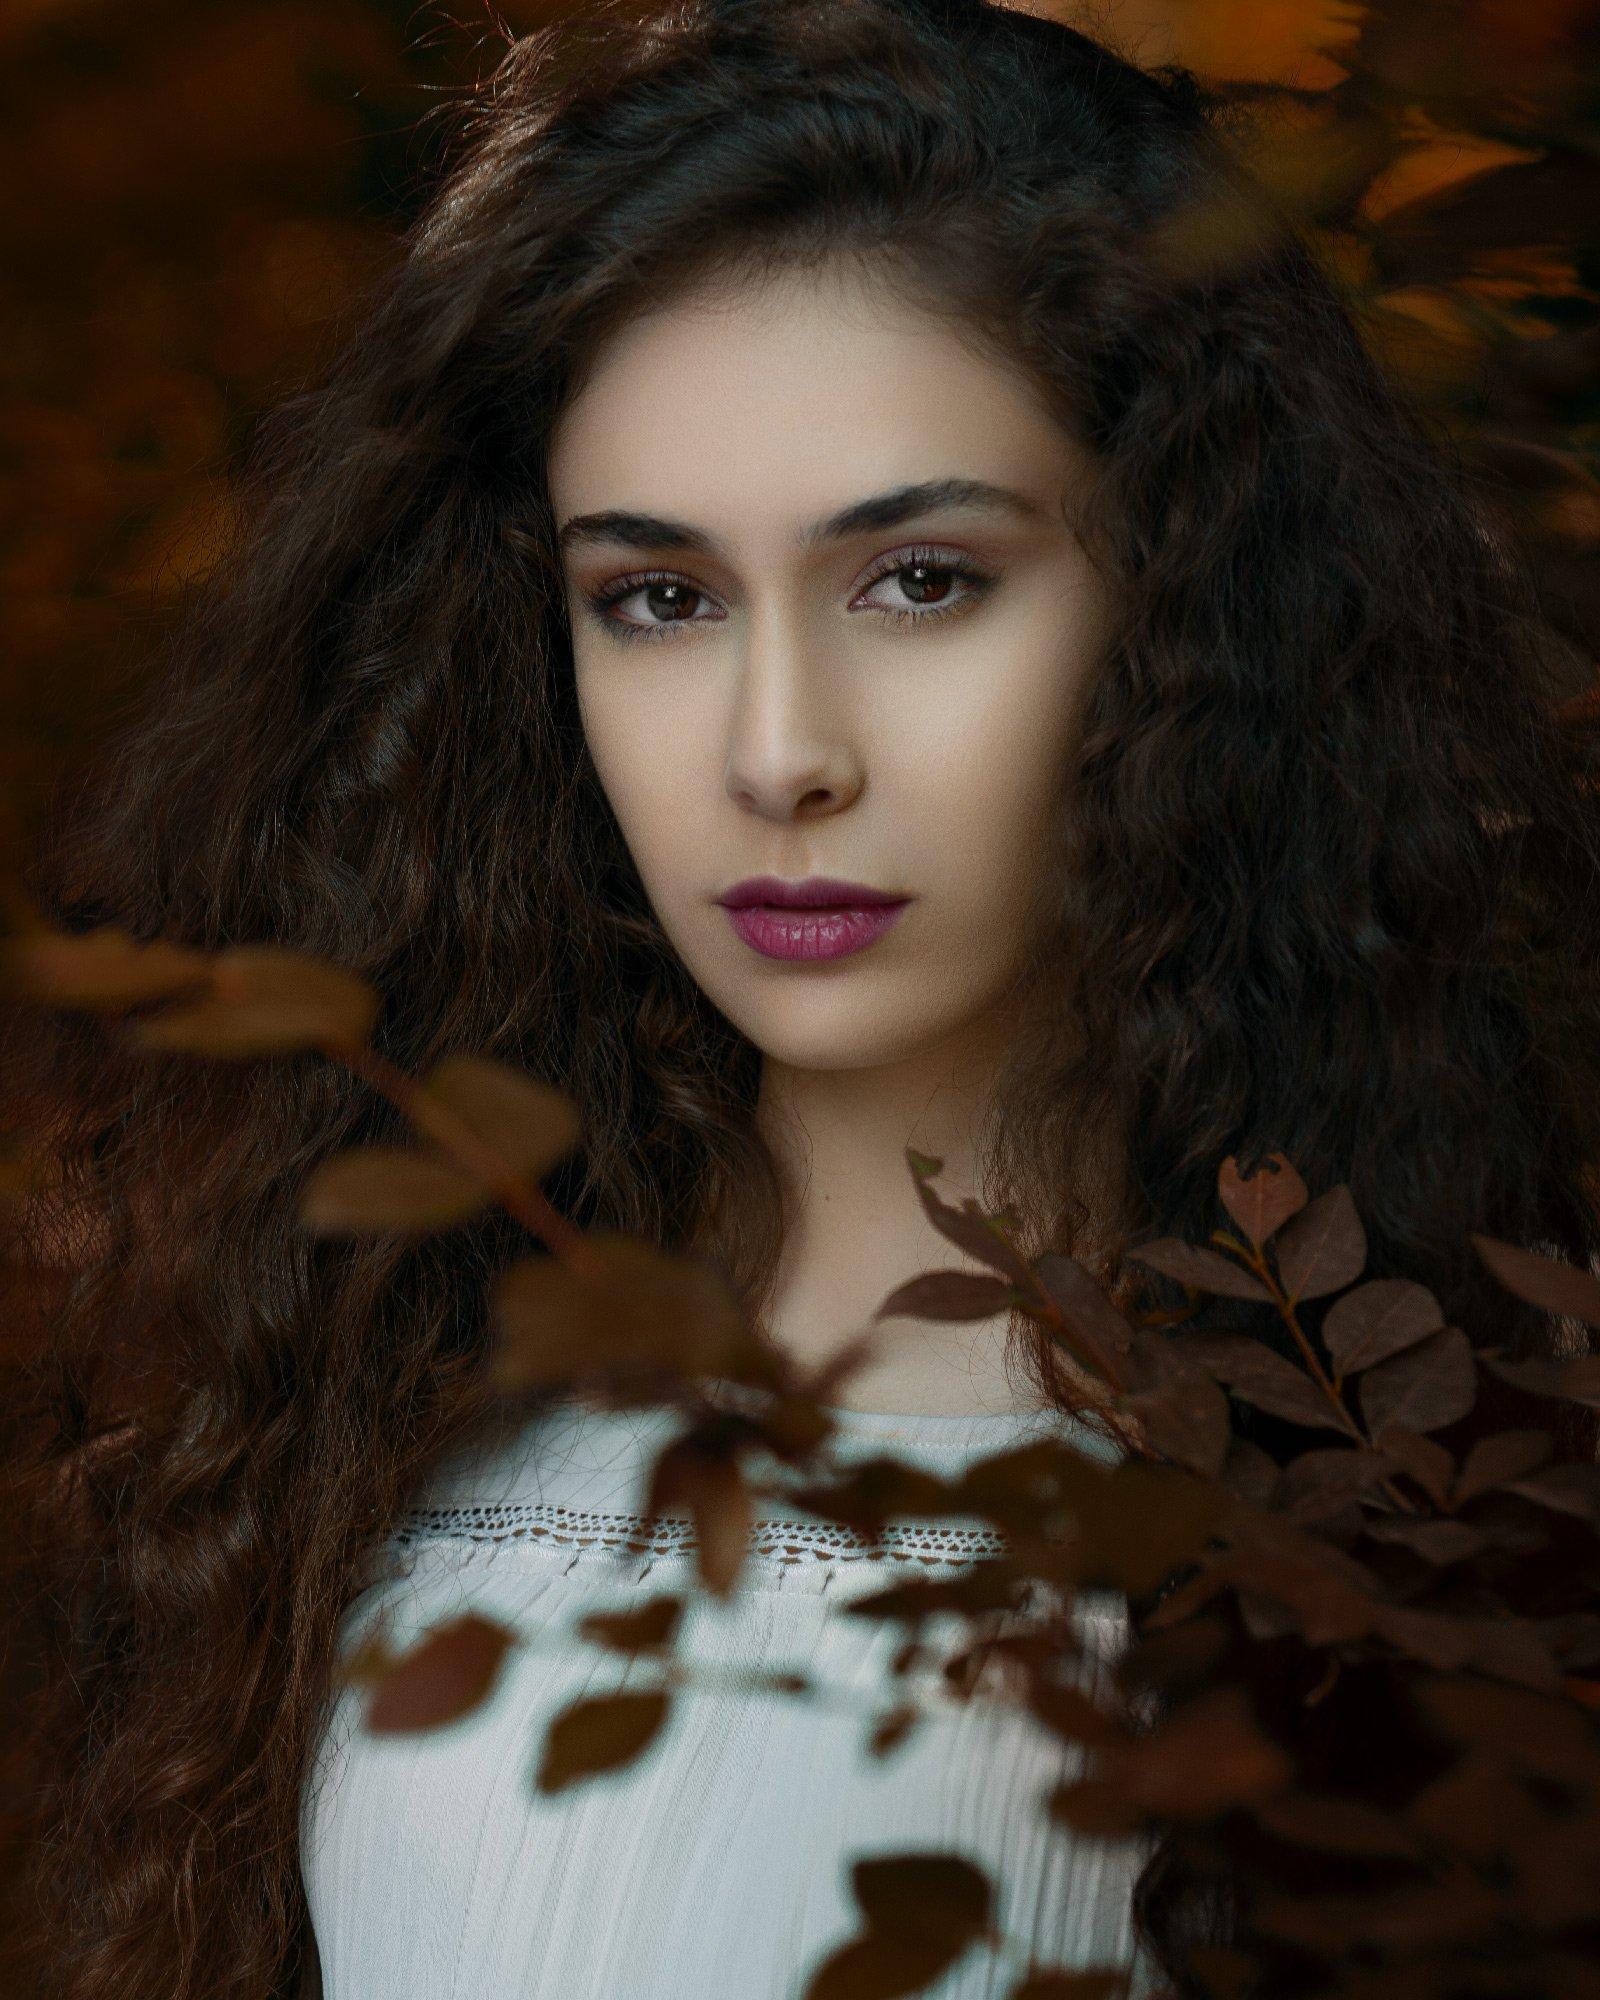 portrait,Art,color,girl,beauty, Amirhossein kazemi